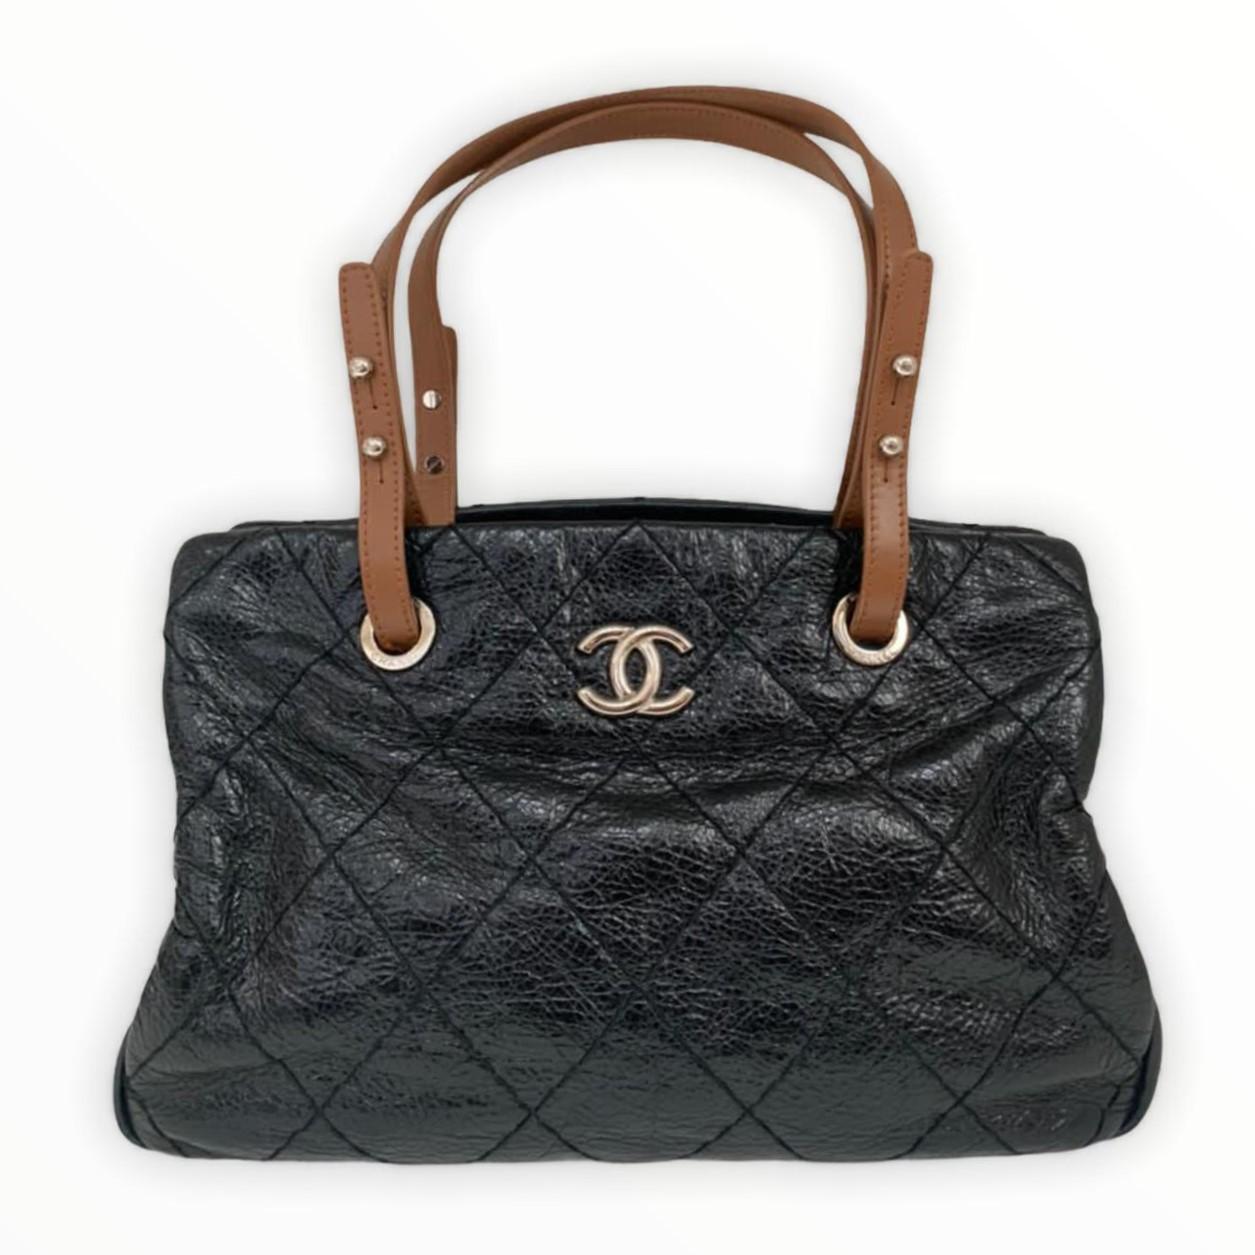 Bolsa Chanel On The Road Tote